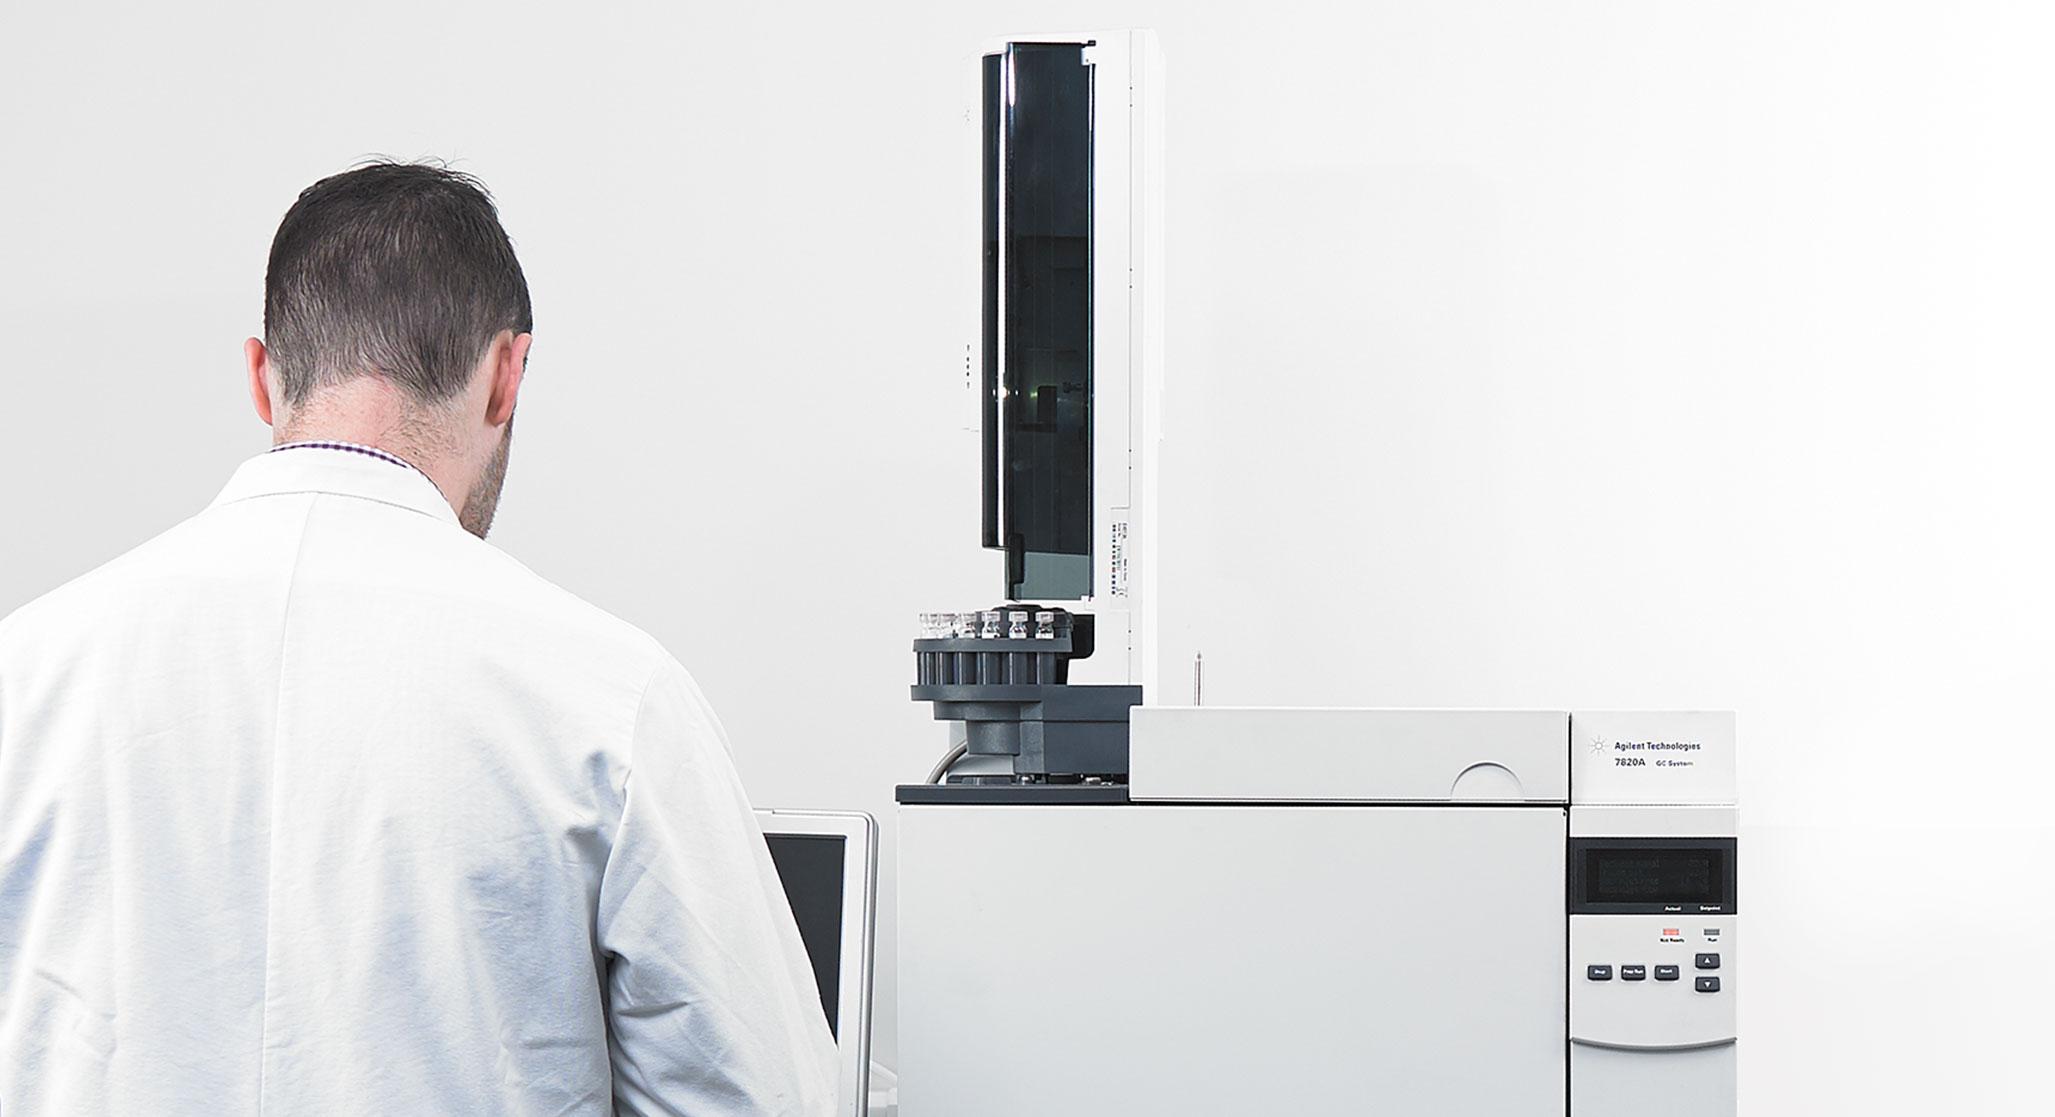 Part 4: Porosity Predicting and Measuring